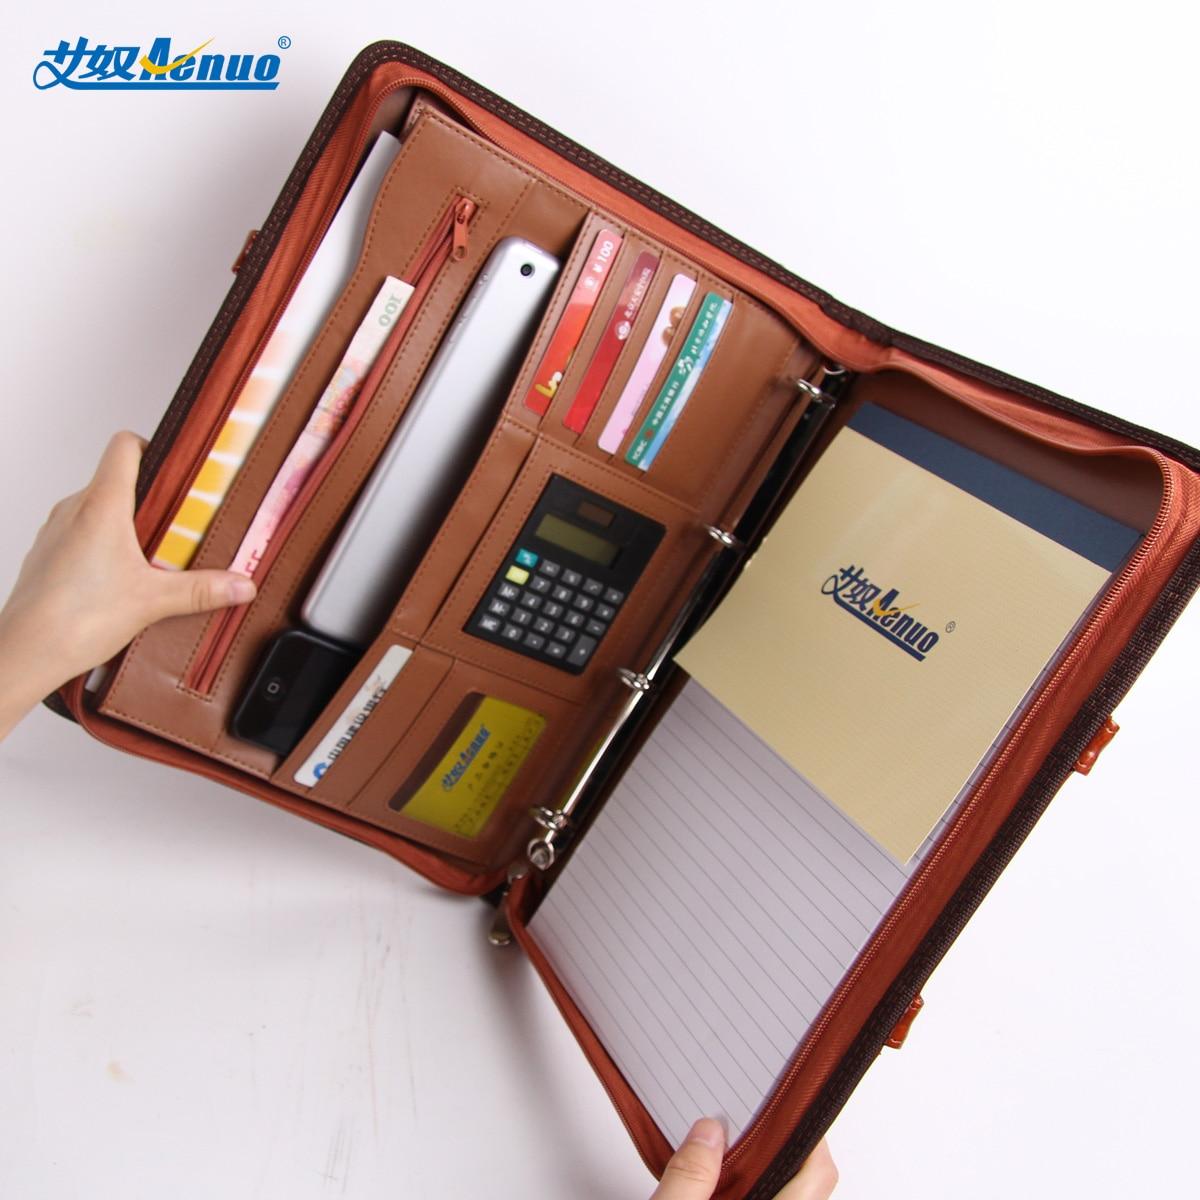 Multifunctional commercial a4 file bag calculator notepad manager folder zipper bag loose-leaf notebook 7623<br><br>Aliexpress